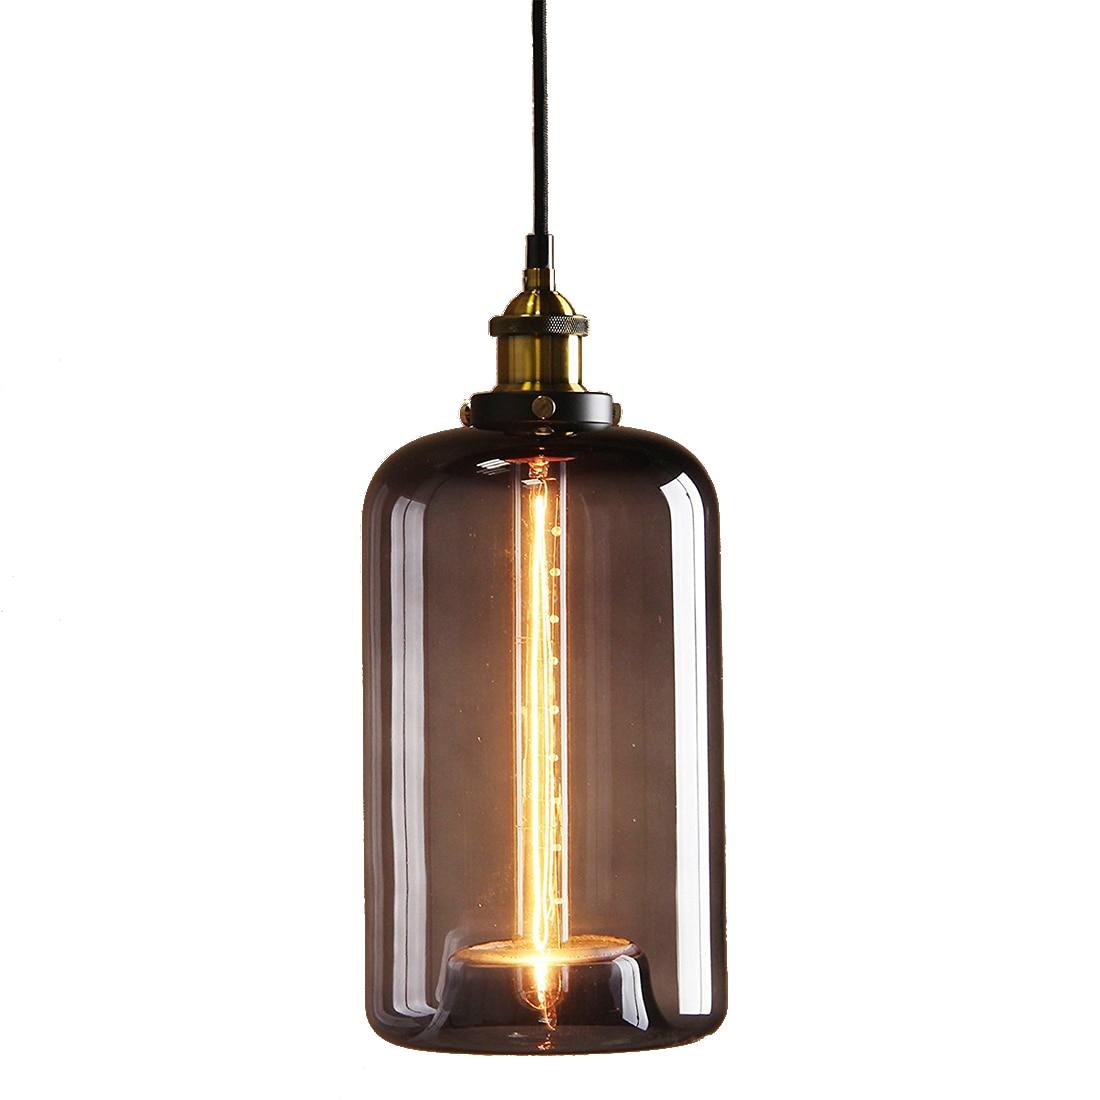 купить Vintage Industrial Metal Finish Black Gray Glass Shade Loft Pendant Lamp  Light Vintage Light fitting недорого